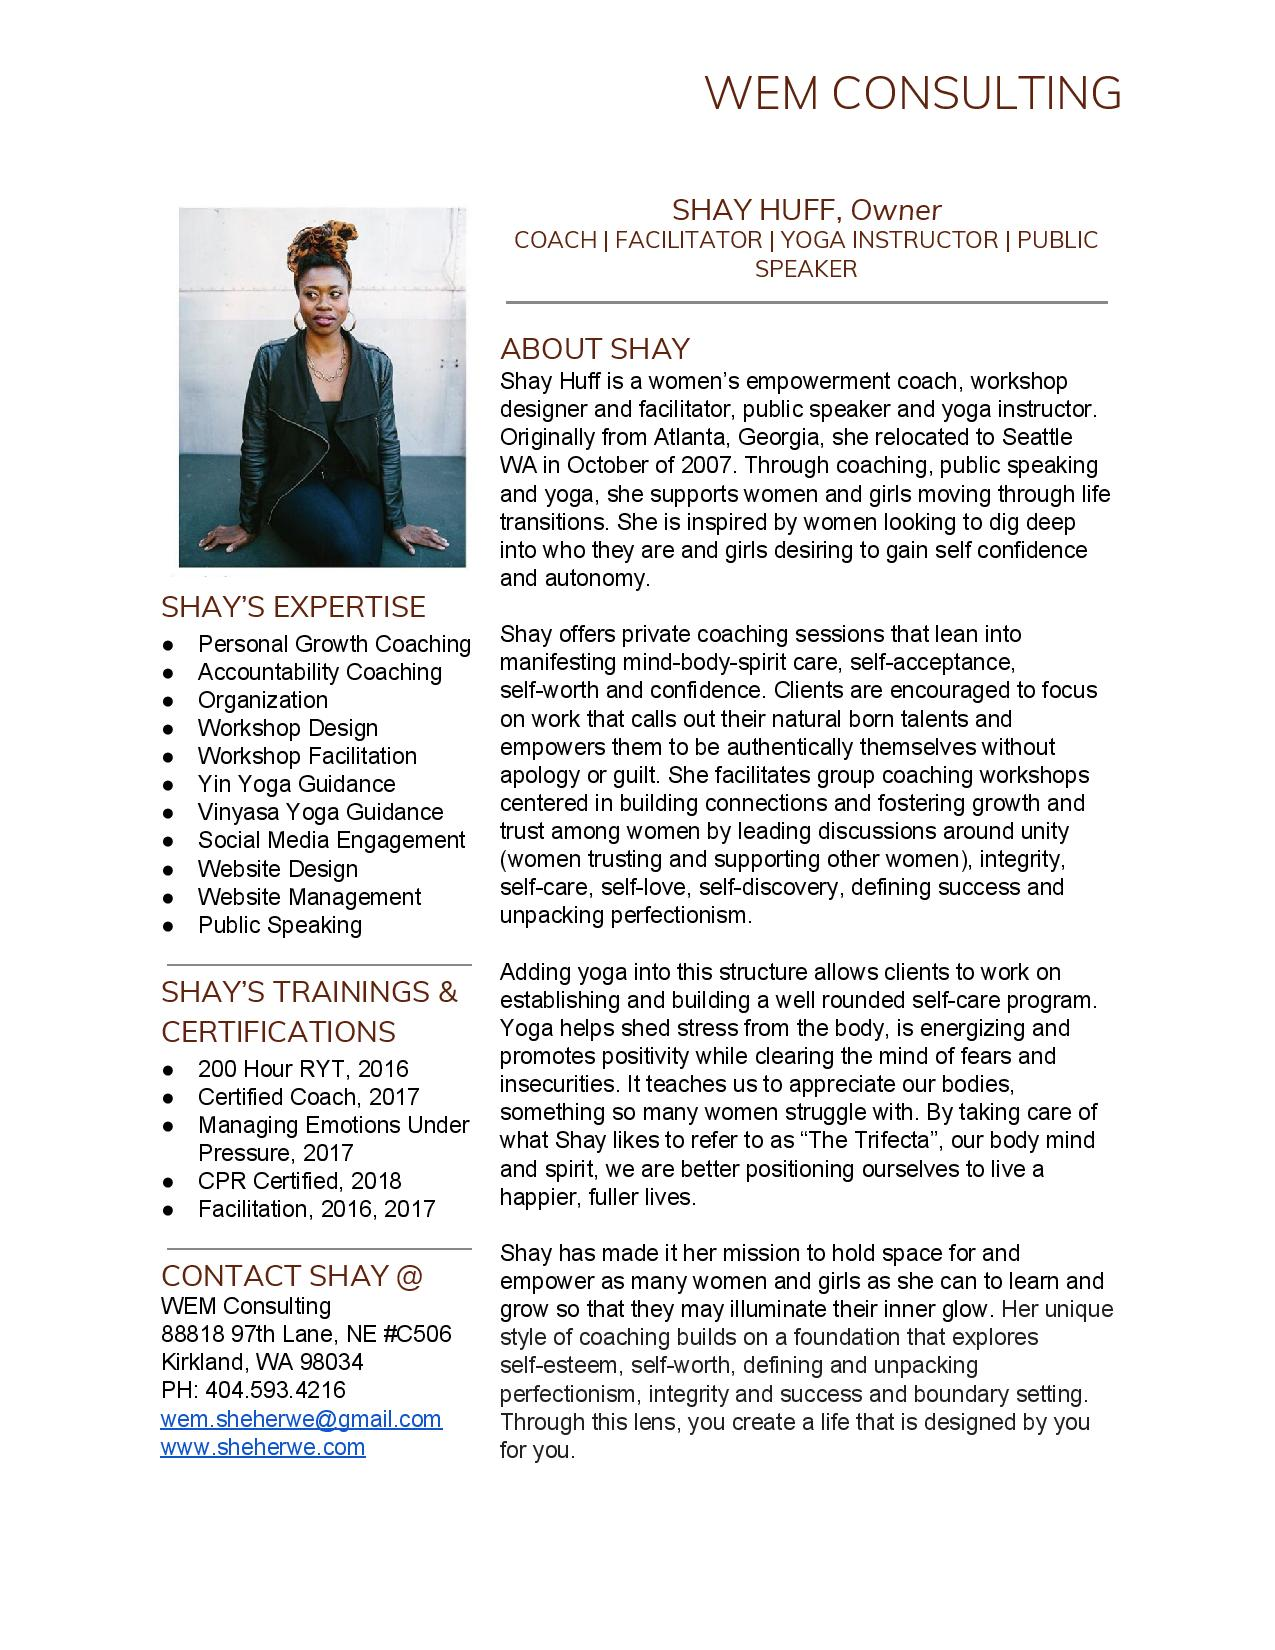 WEM Consulting Resume v4-06-2018 -page-1.jpg